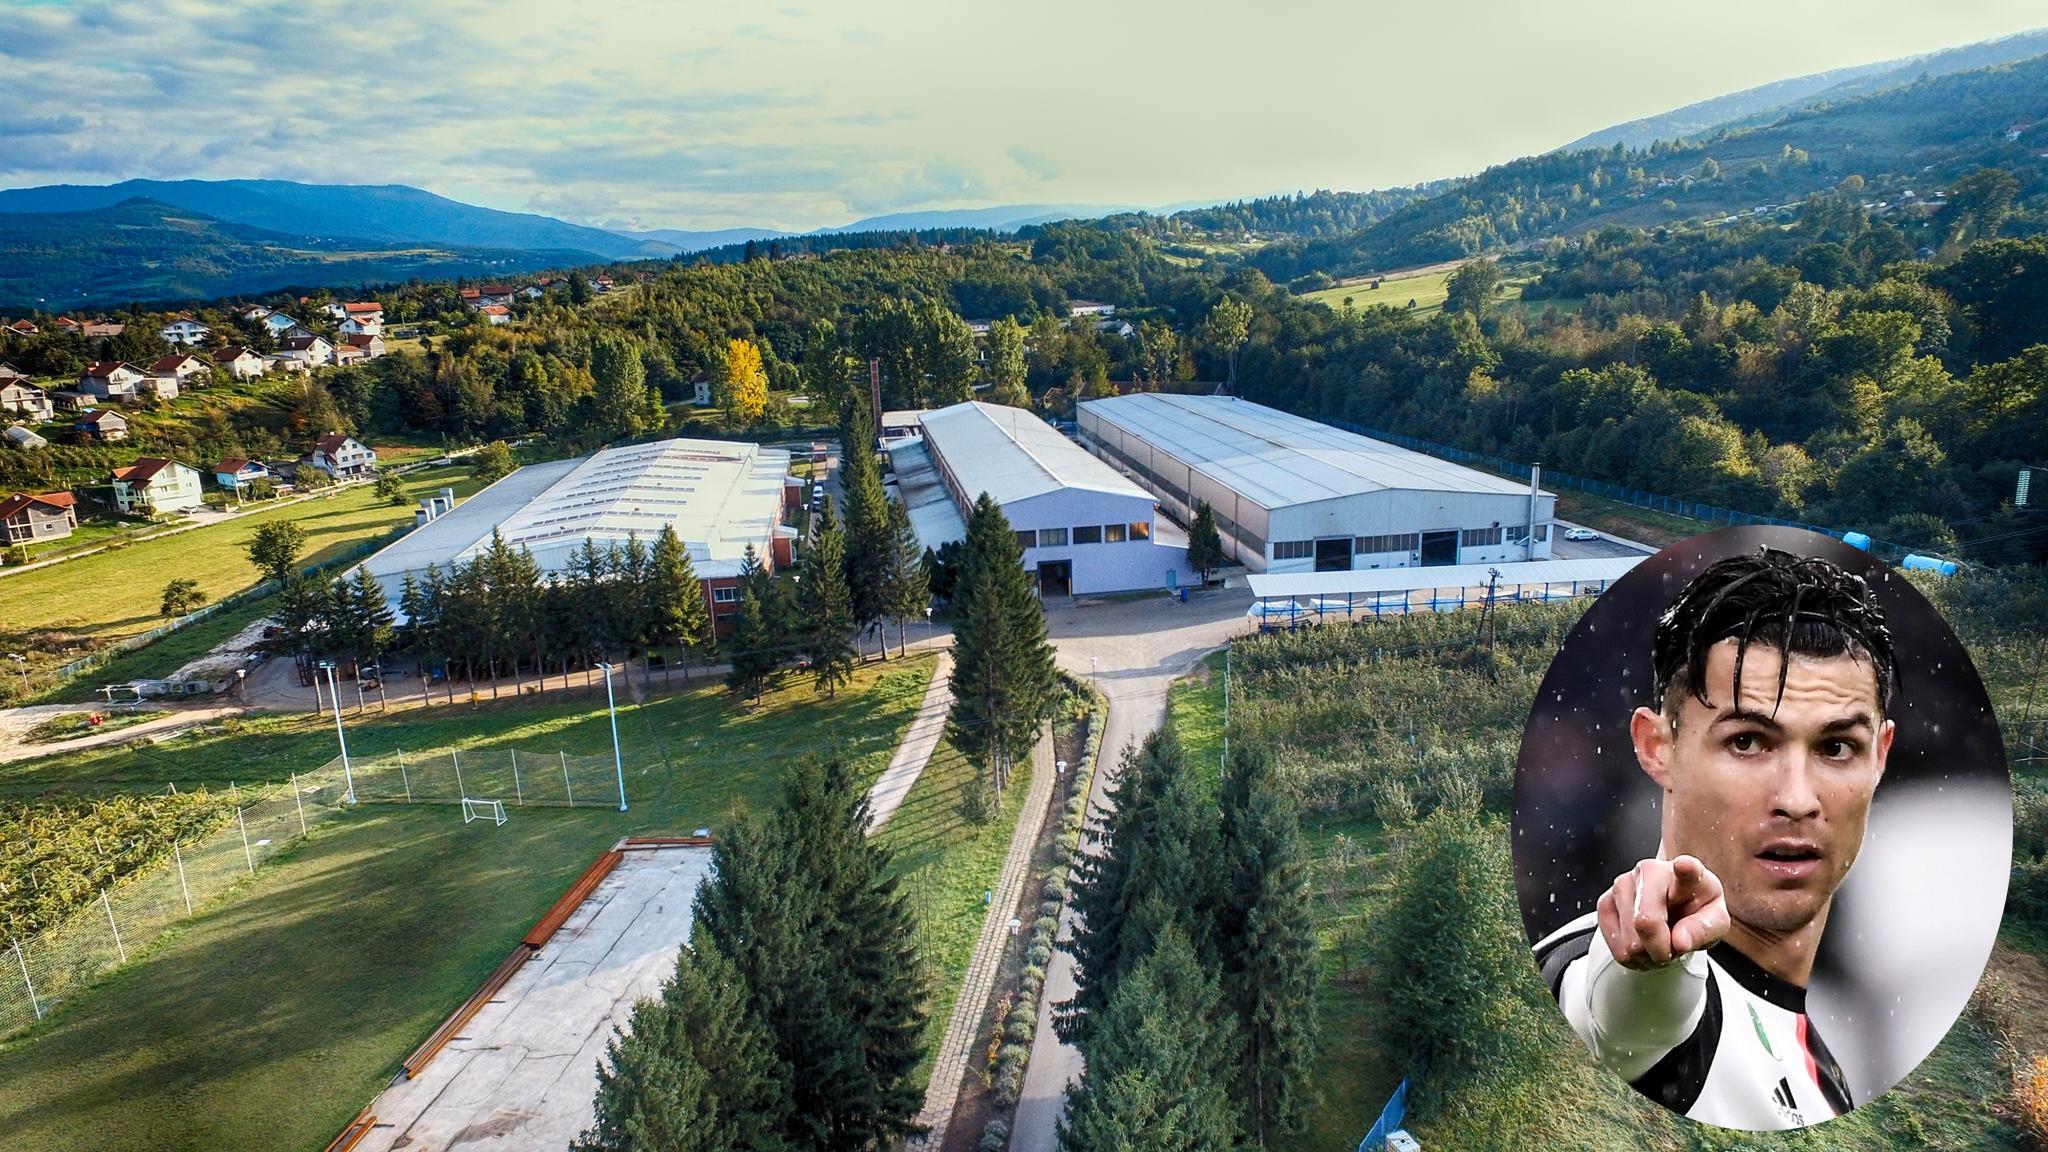 GS - Tvornica mašina Travnik i Cristiano Ronaldo u krugu